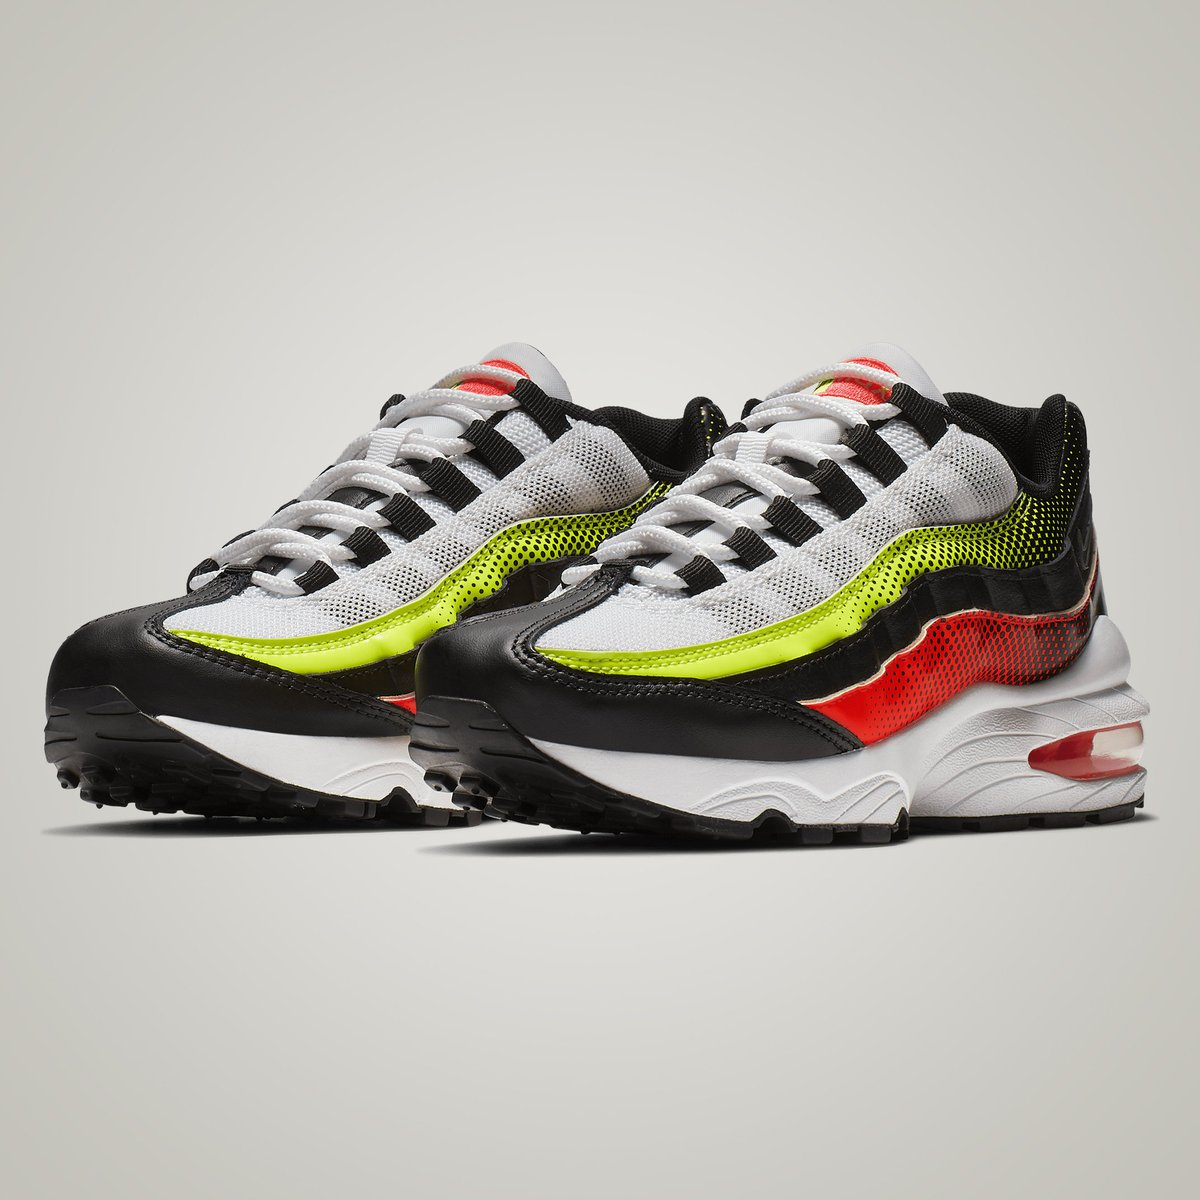 Get The NikeCourt Vapor RF x Air Max 95 Neon Now